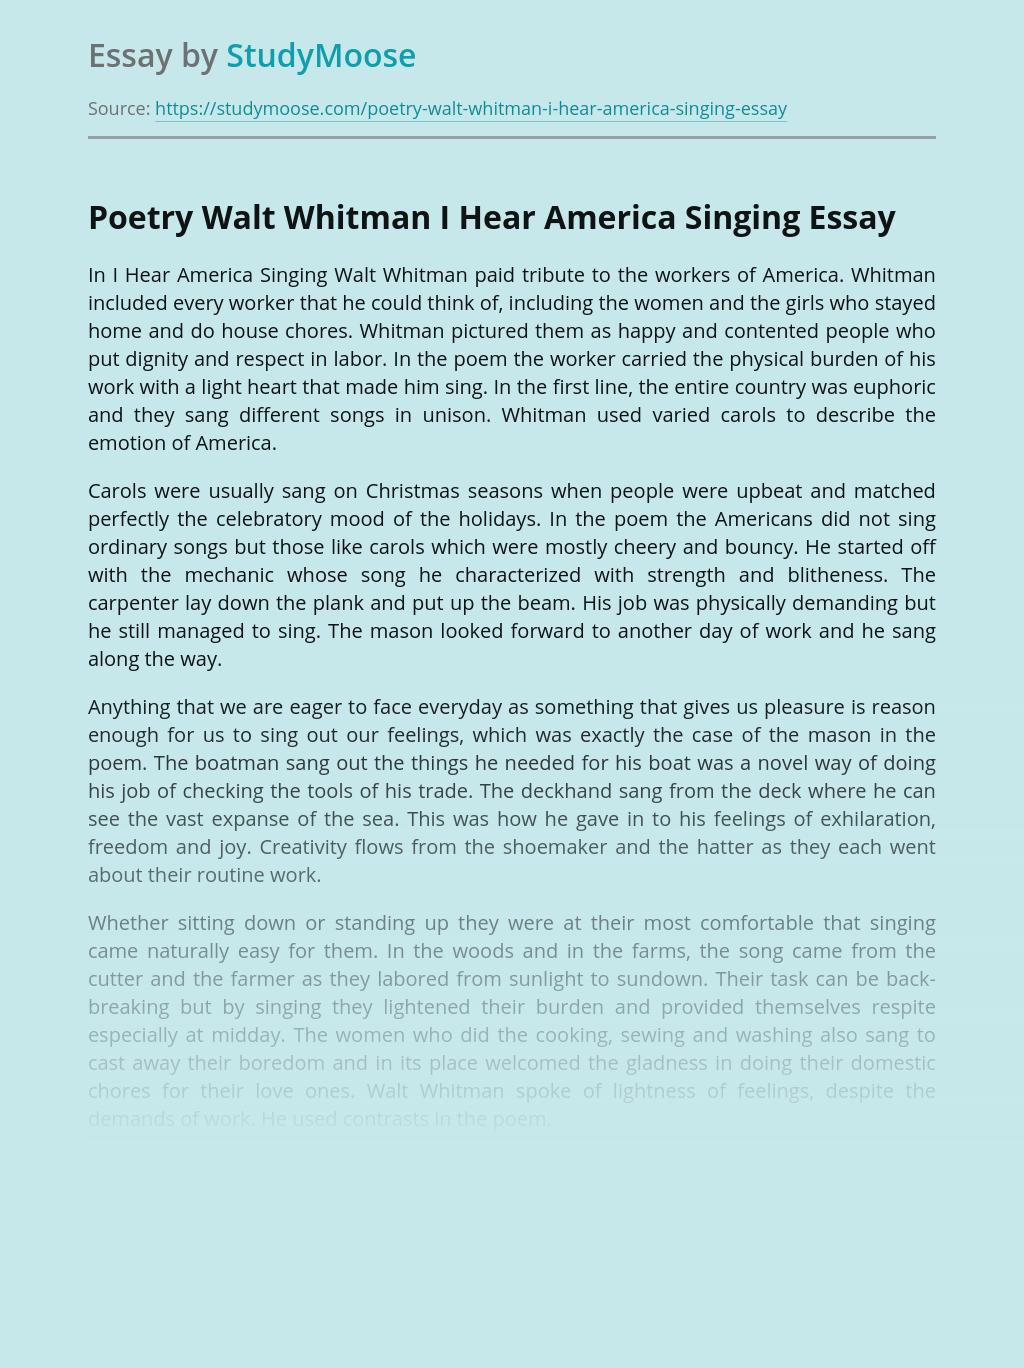 Poetry Walt Whitman I Hear America Singing